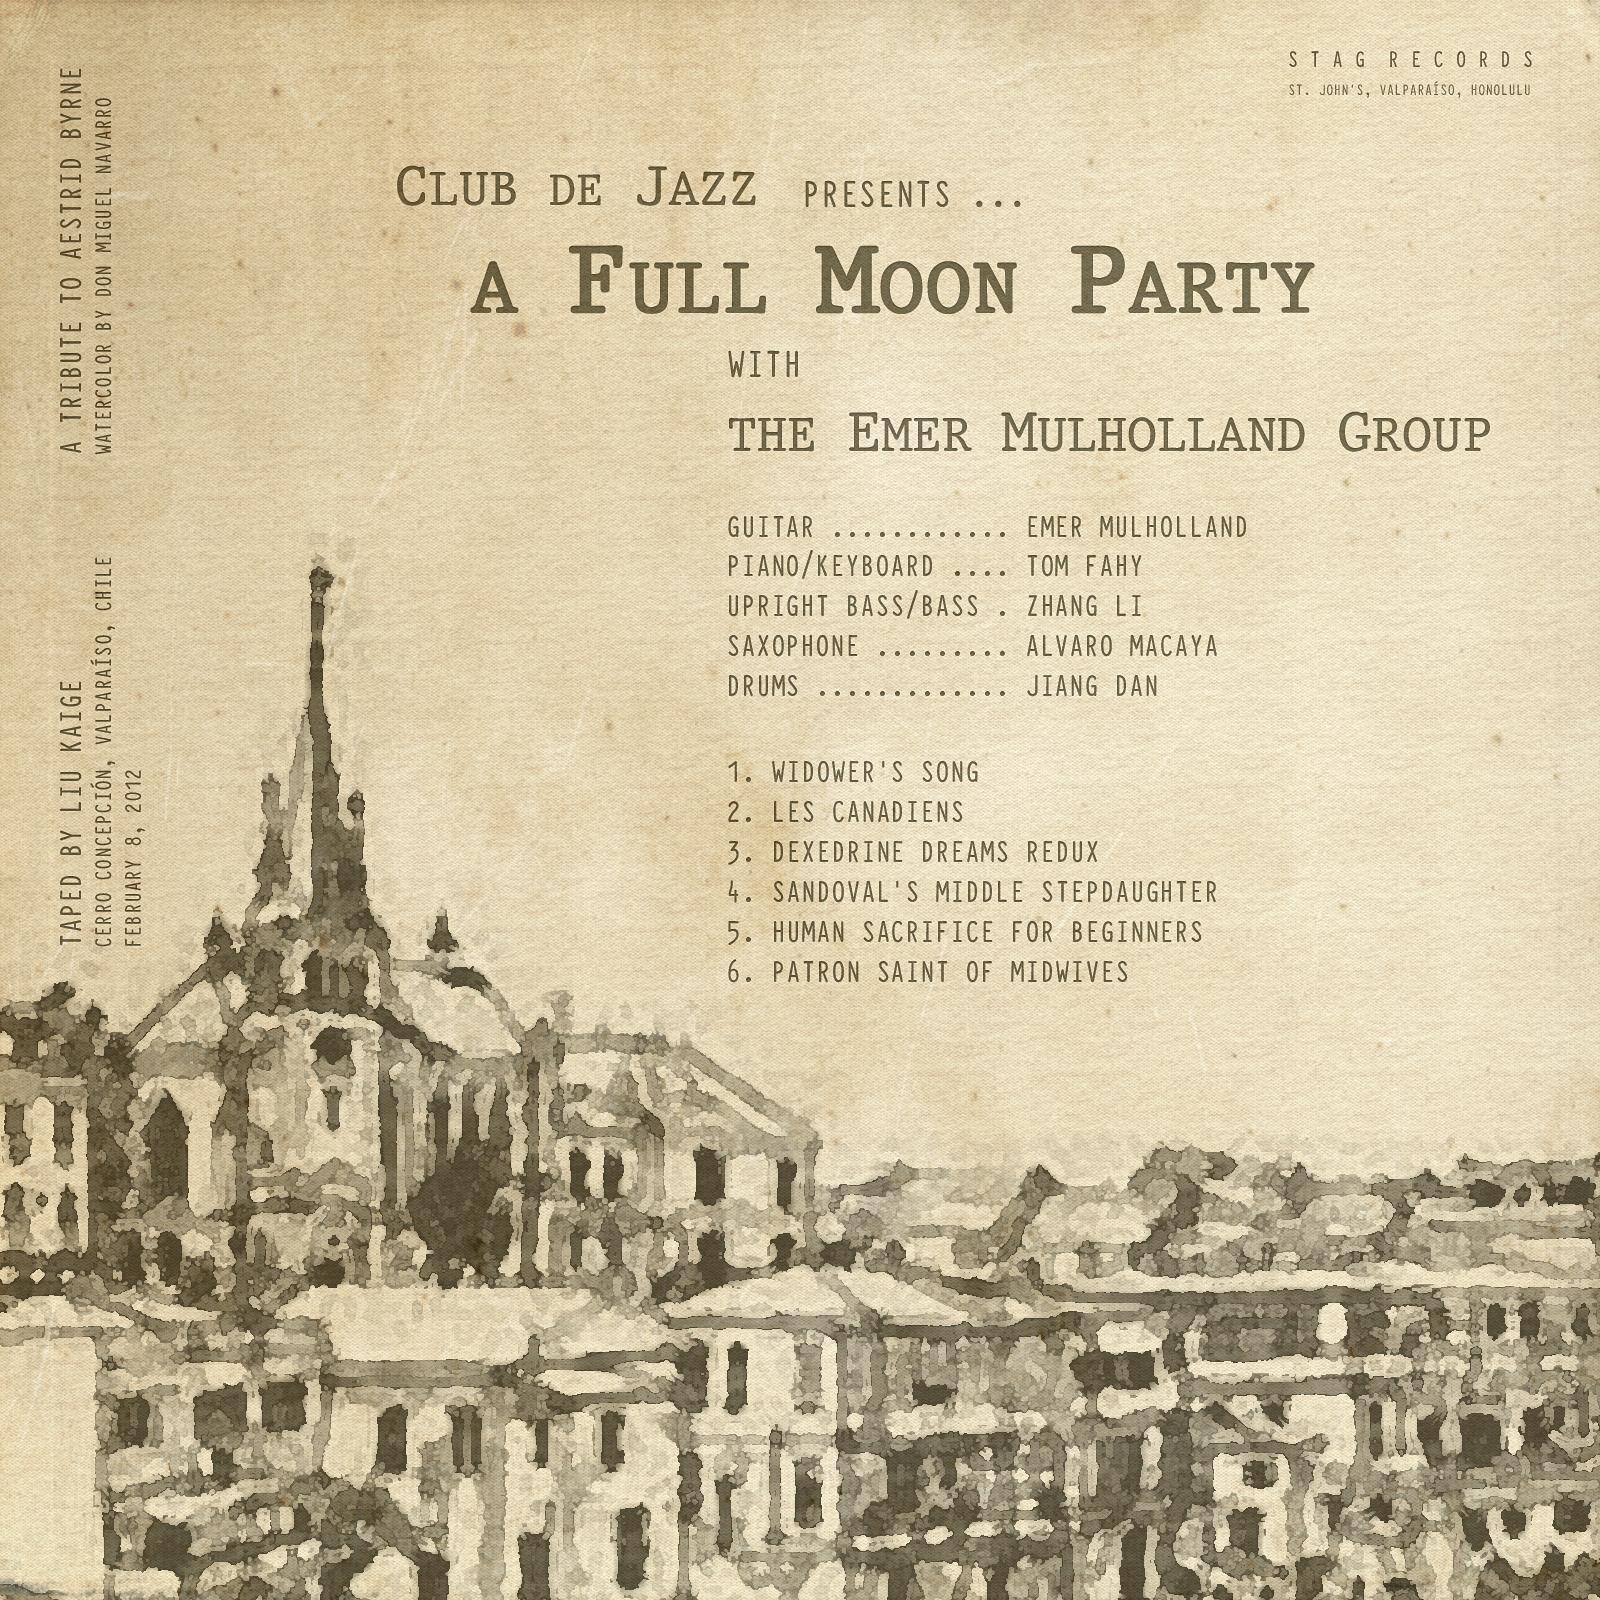 Club de Jazz presents... A Full Moon Party